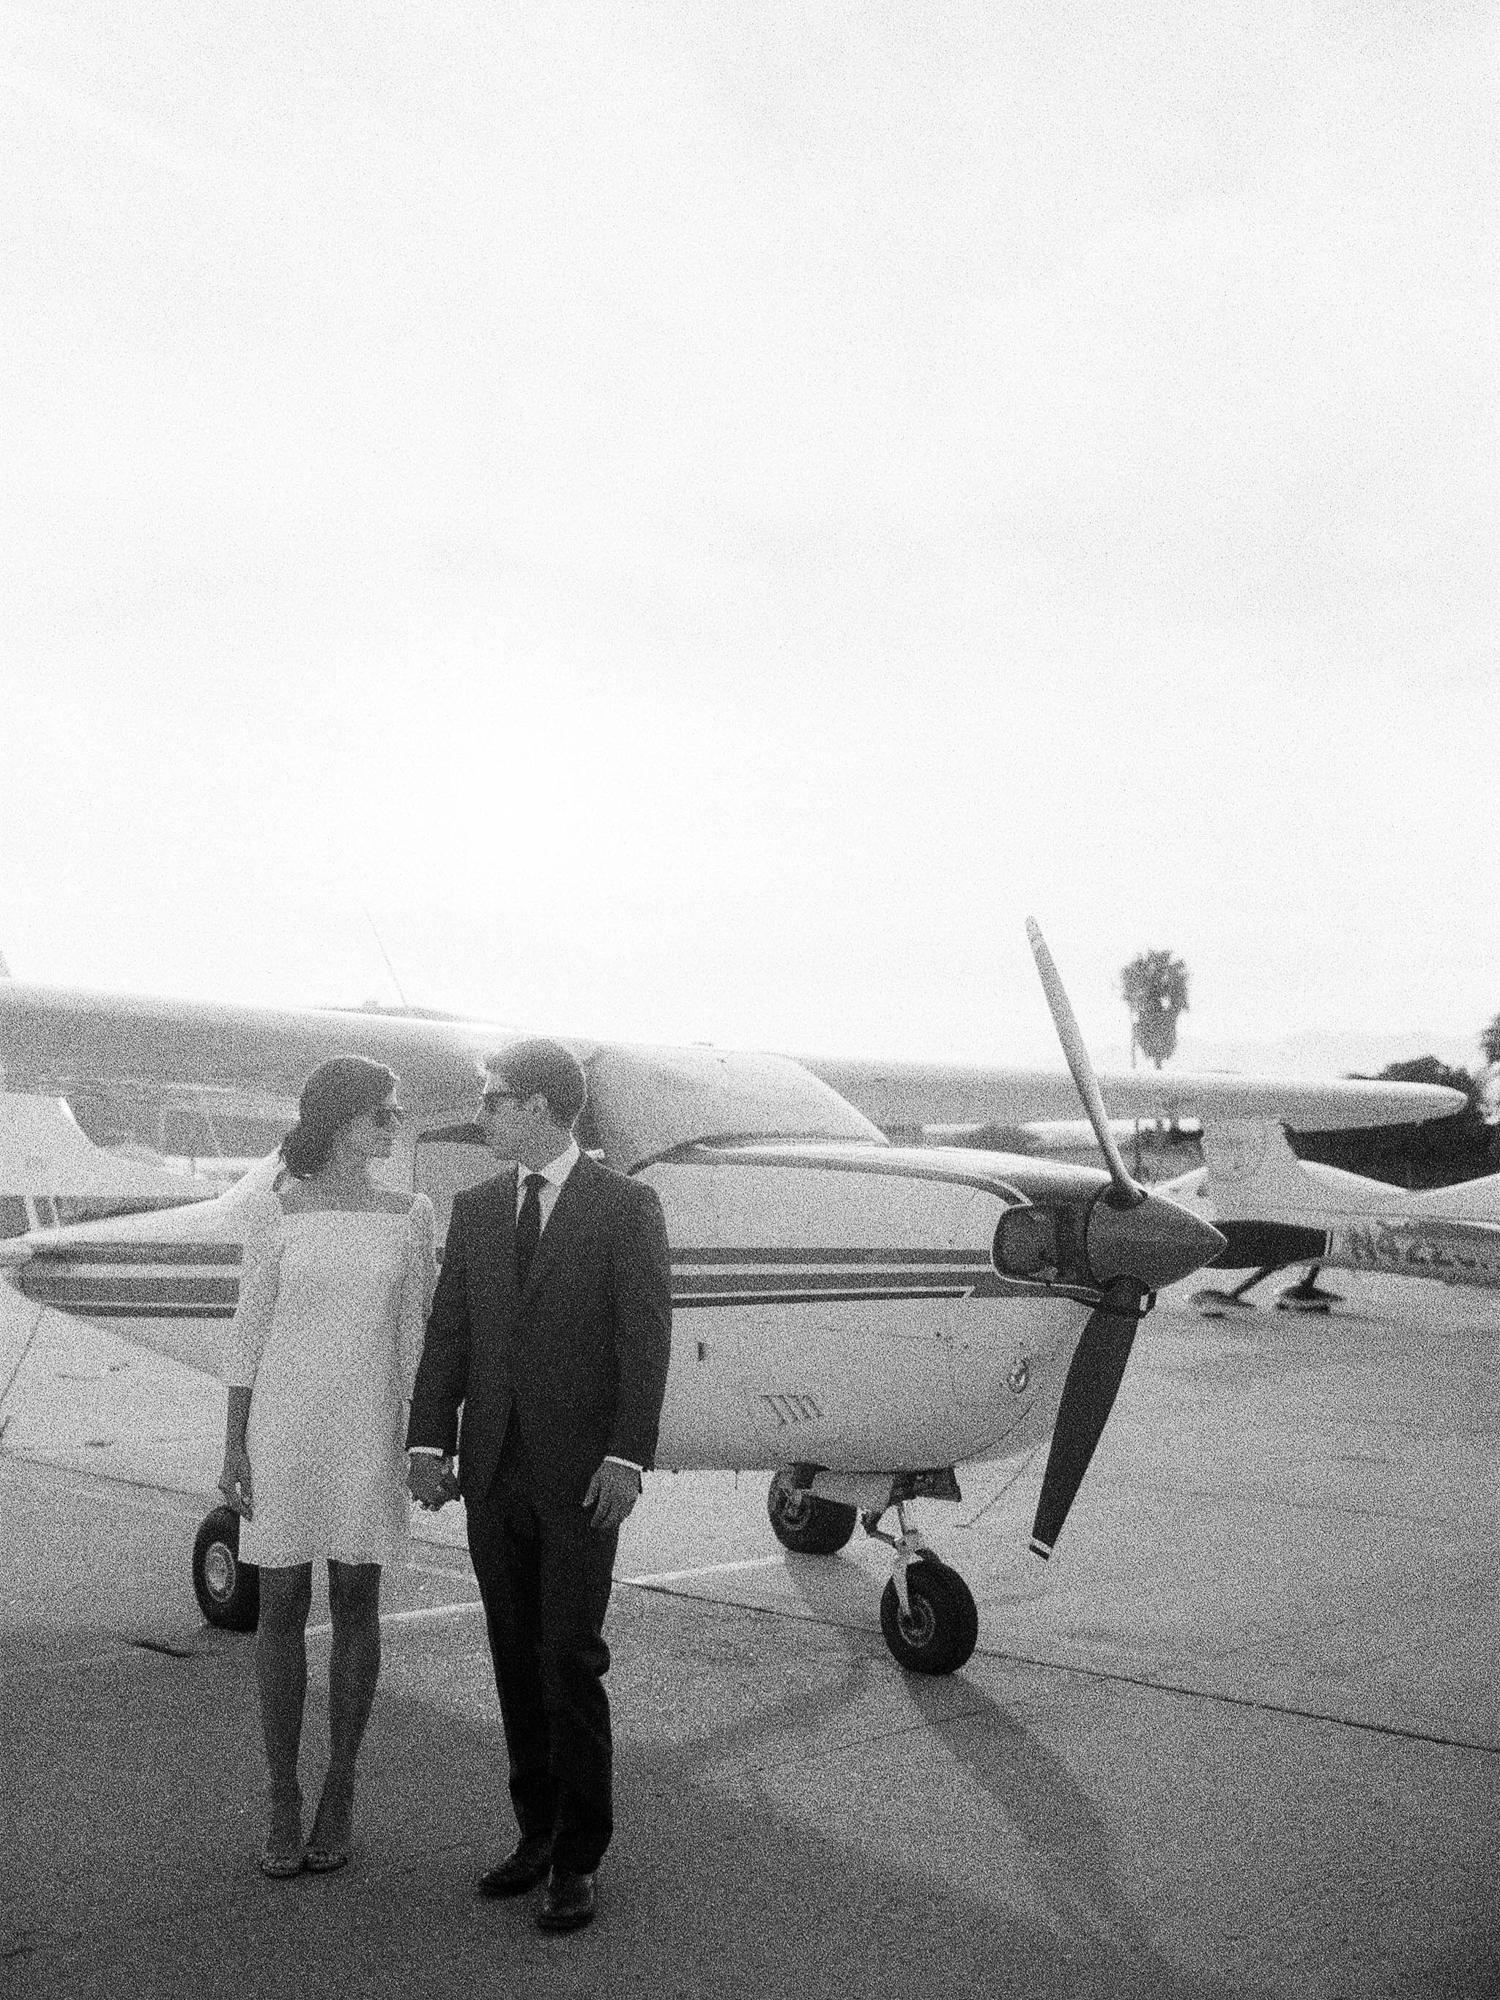 airport-engagement-shoot-25.jpg